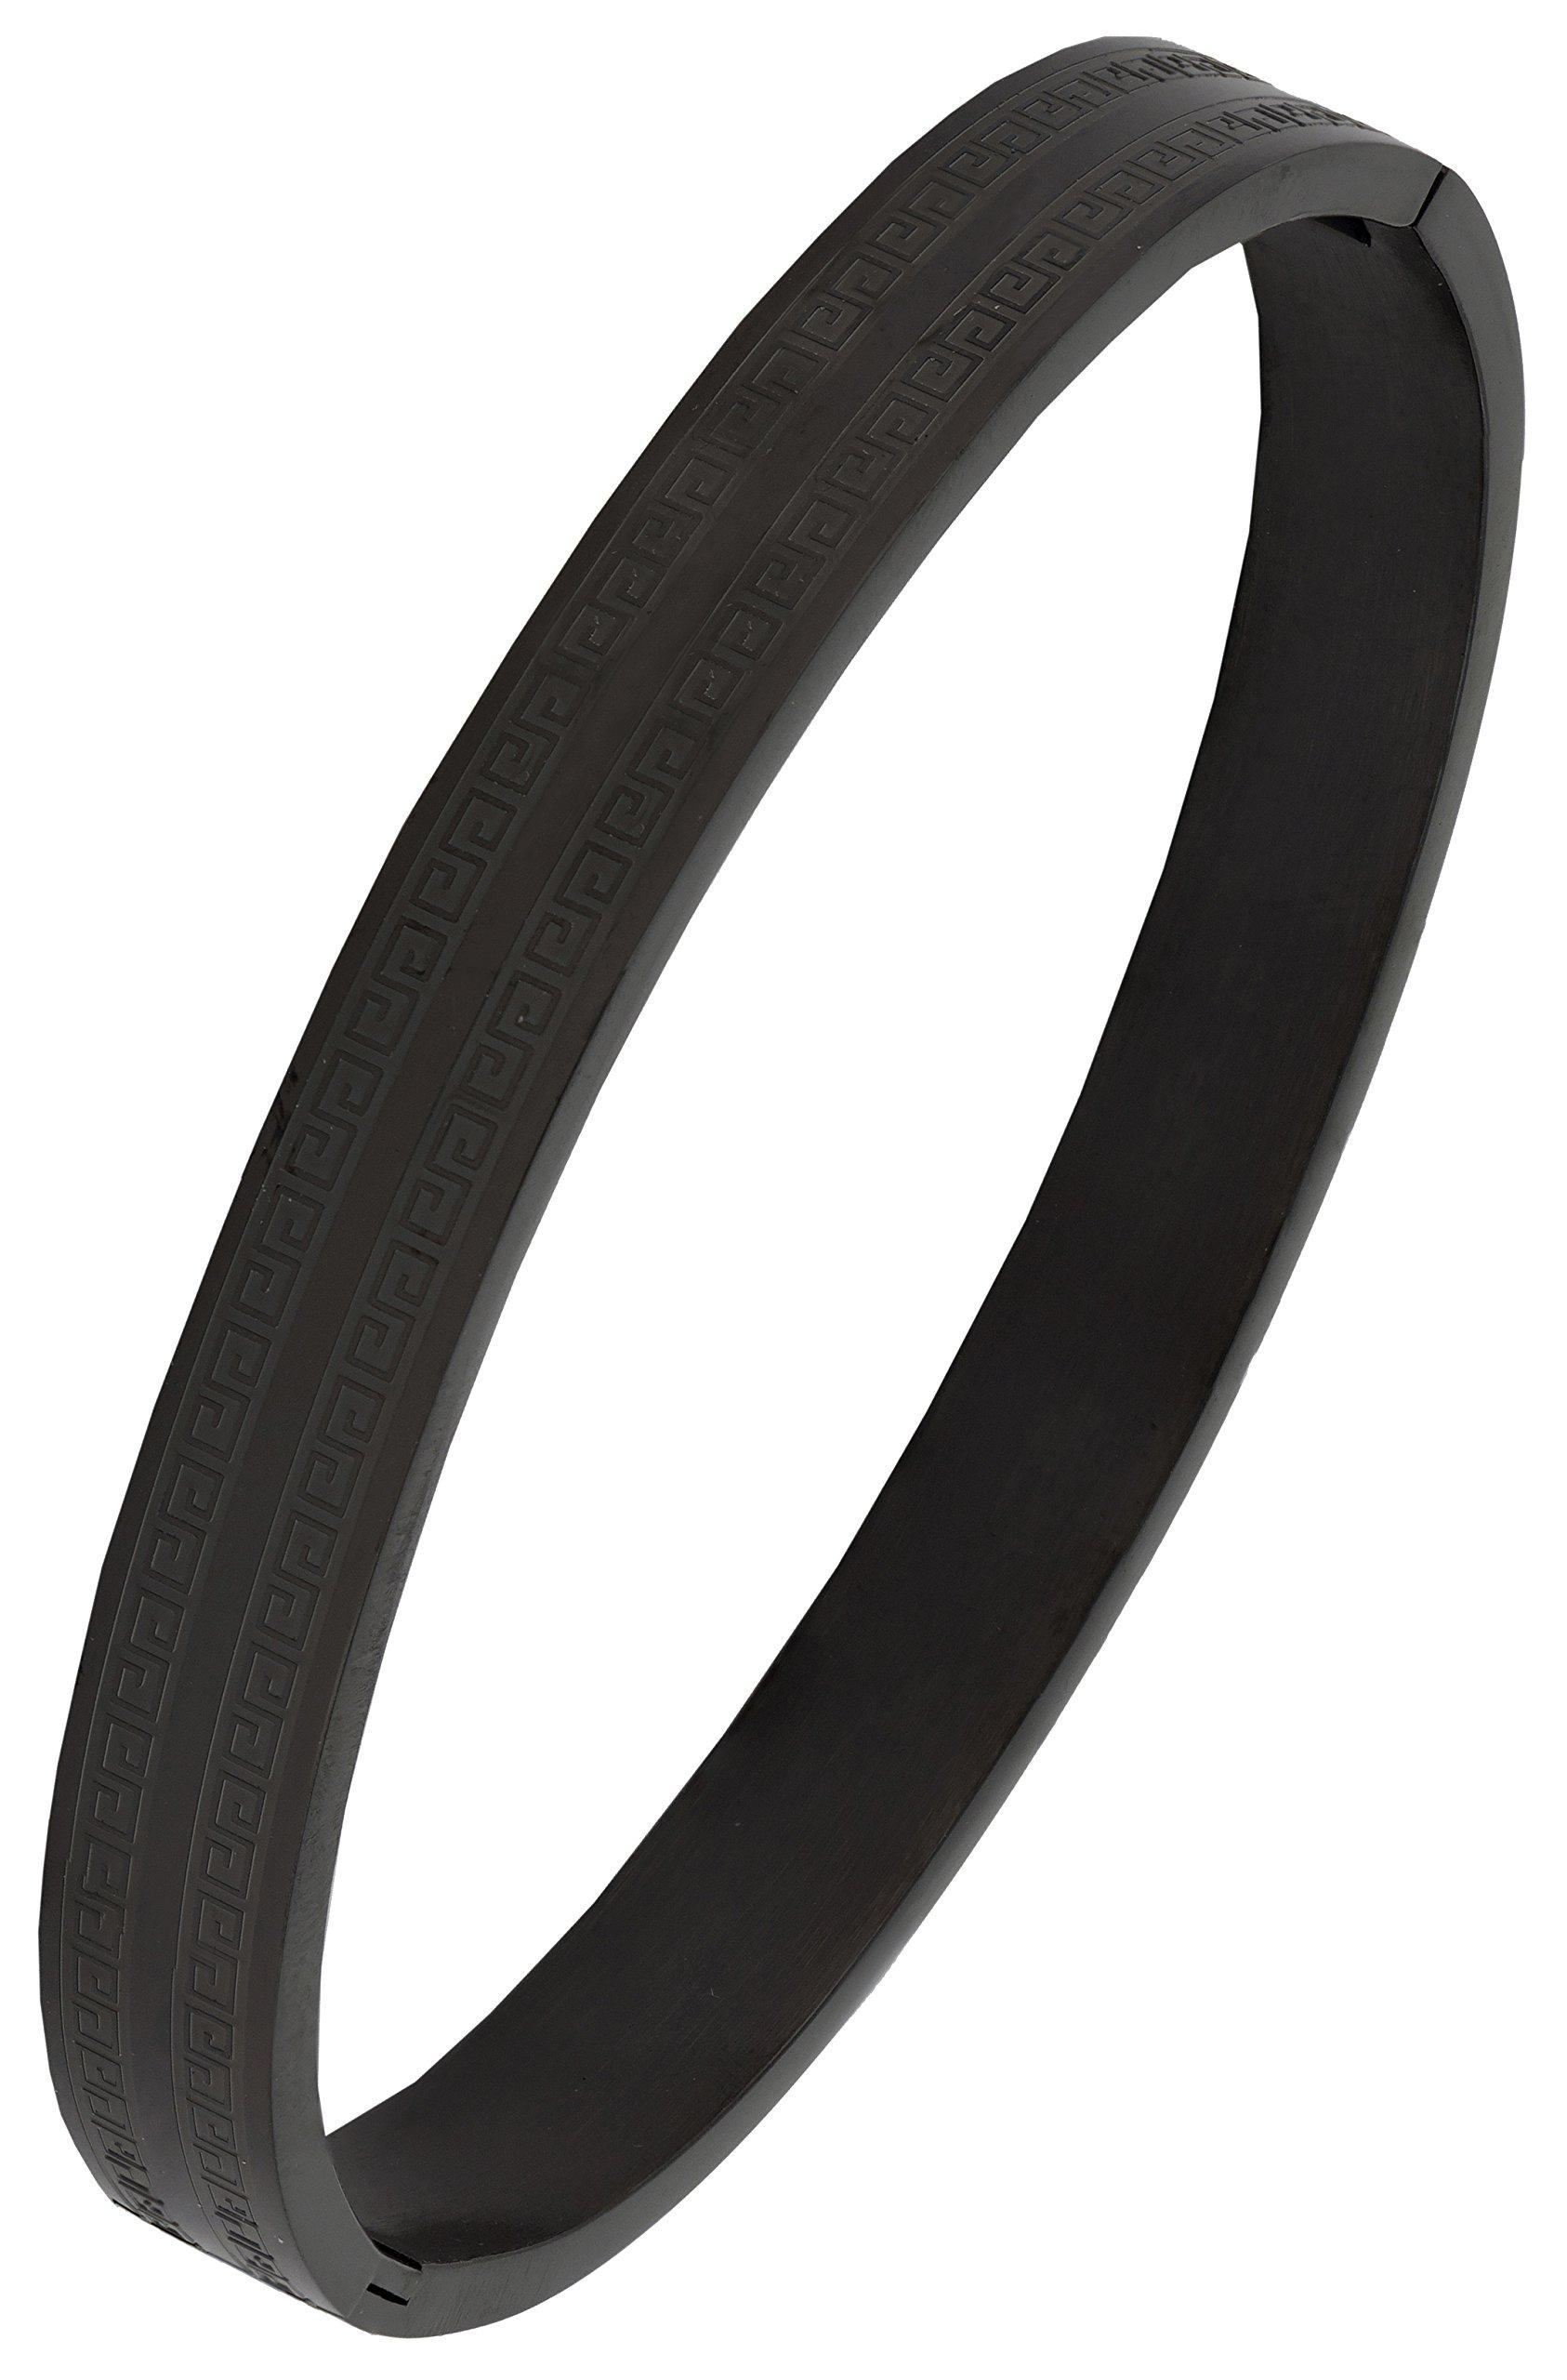 Zivom® Italian Designer 316L Surgical Stainless Steel Openable Bangle Kada Bracelet Men Boys product image